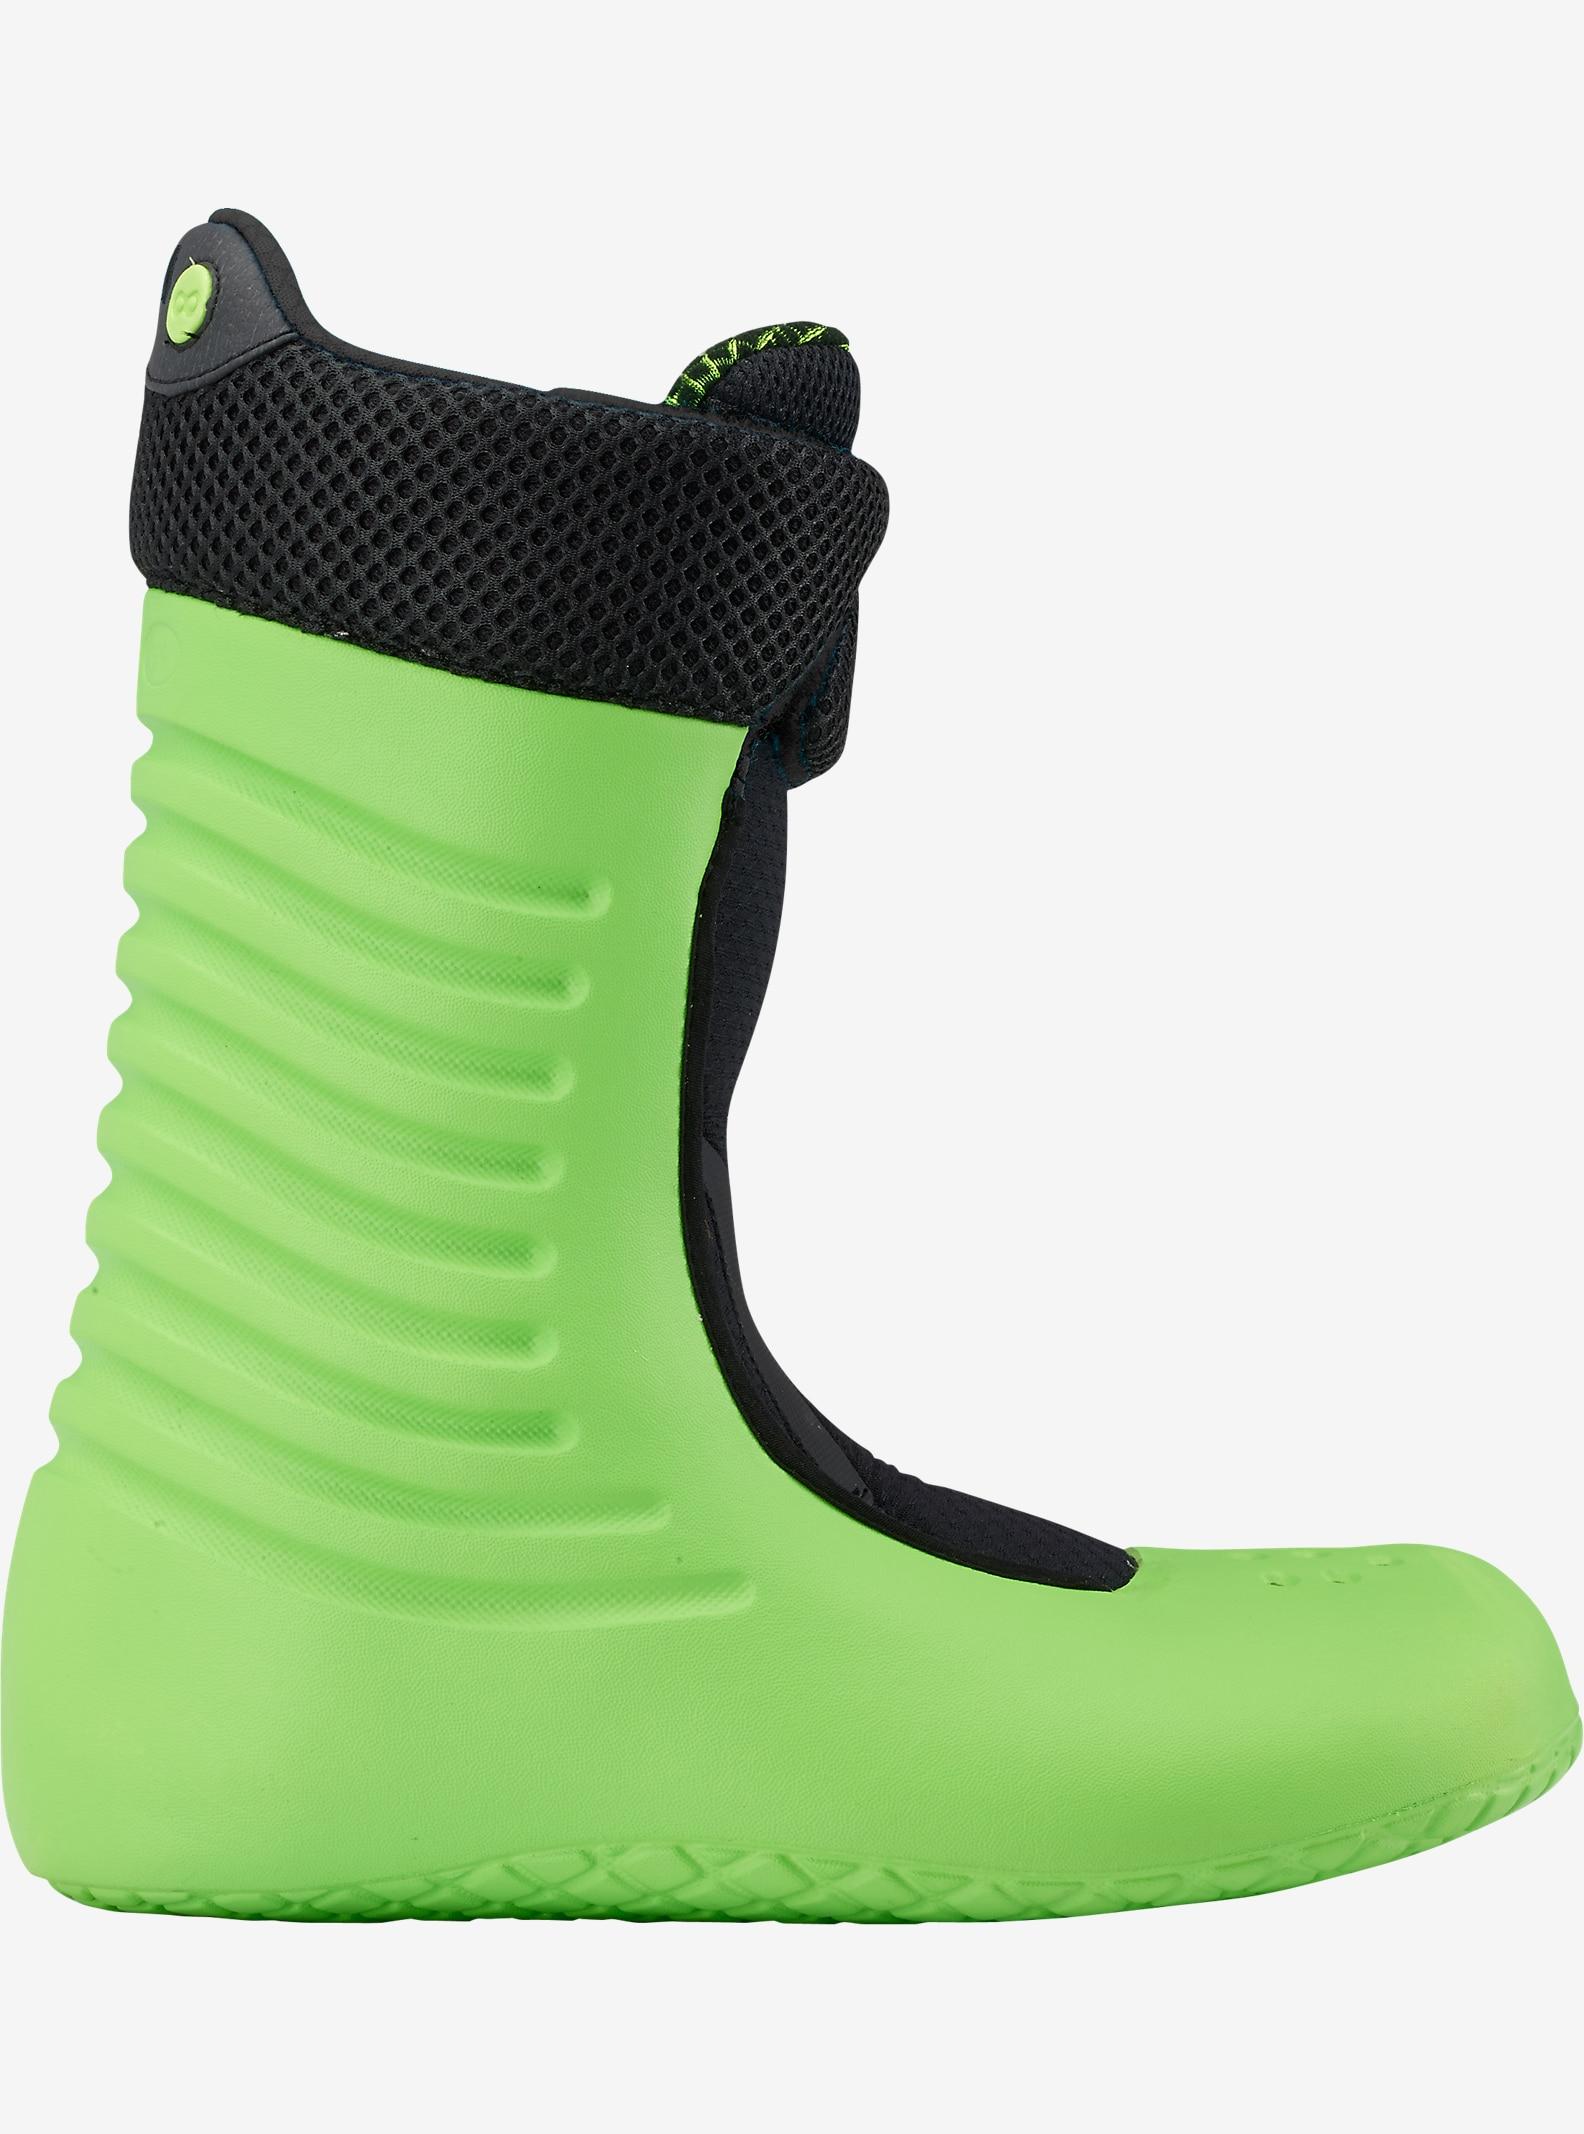 Men's Burton Infinite Ride Snowboard Boot Liner shown in Black